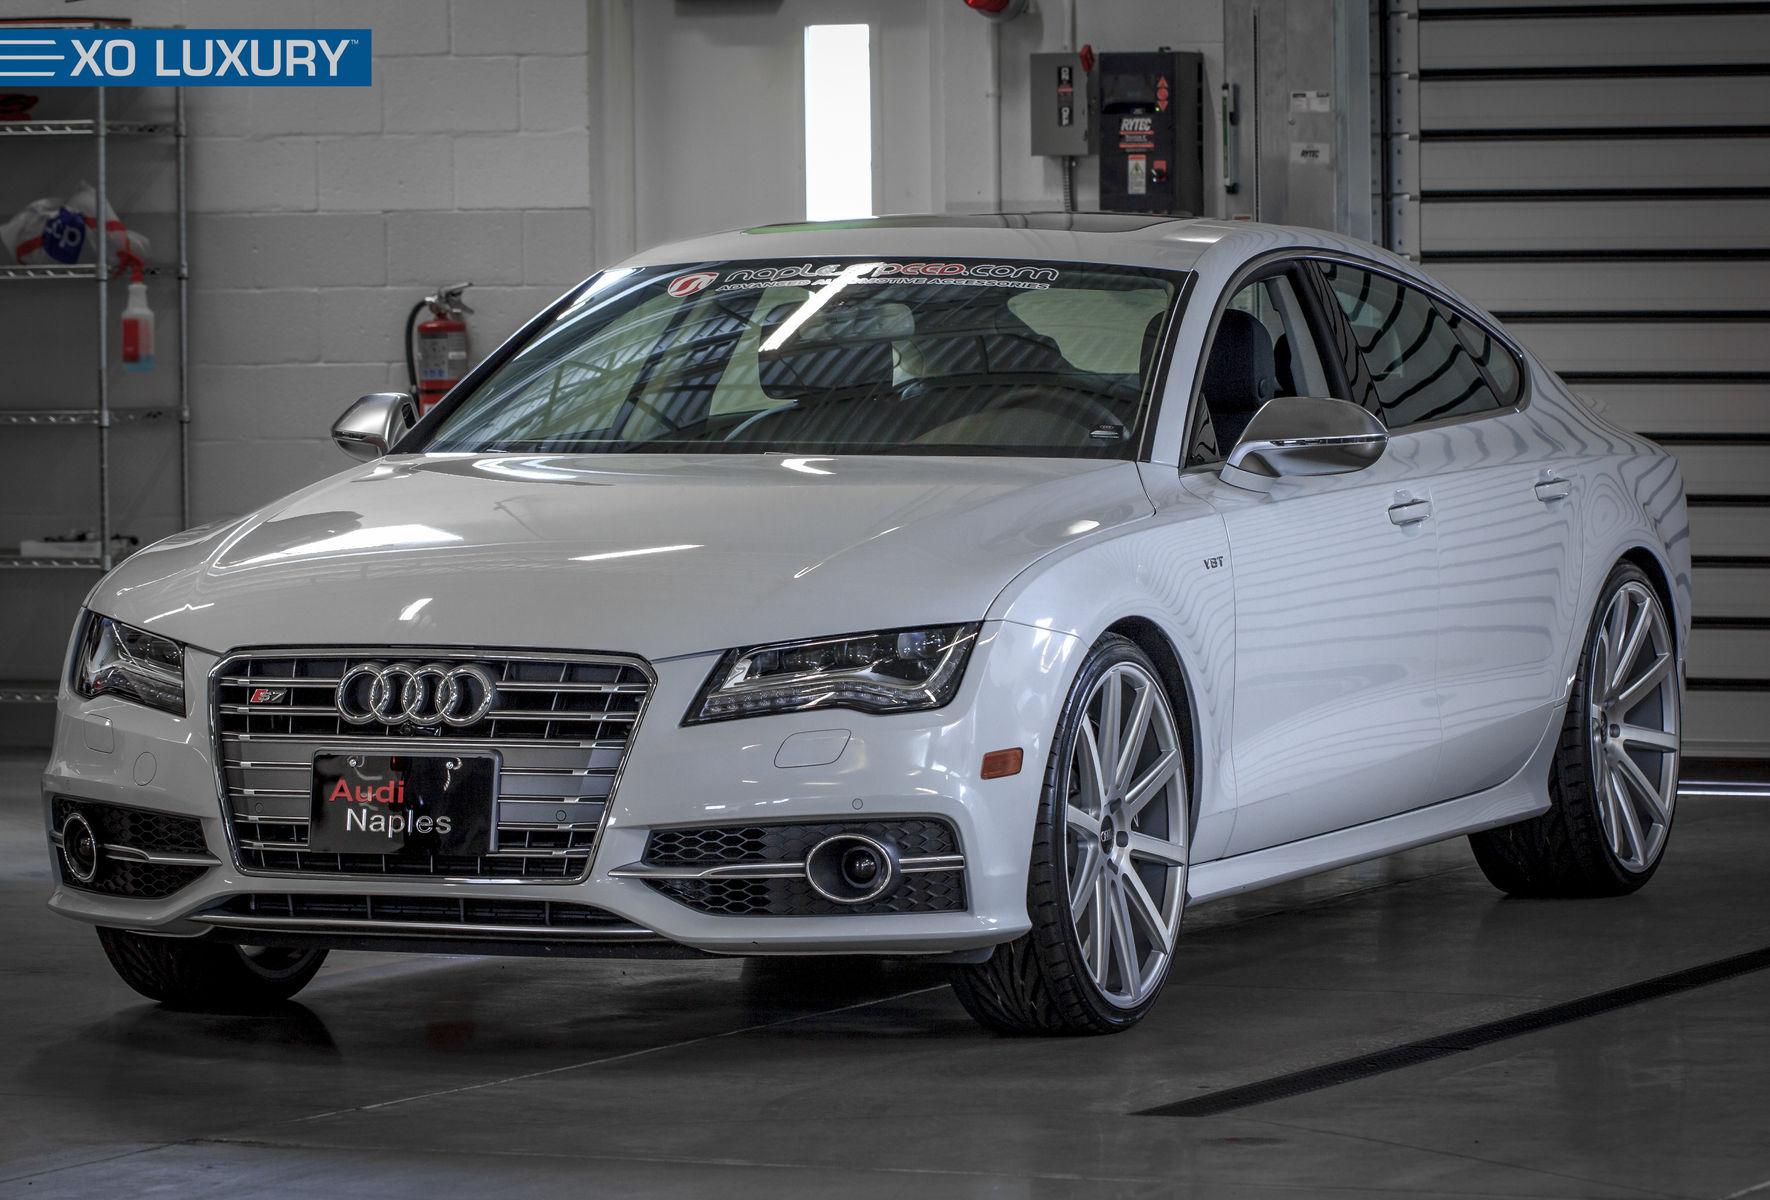 Audi RS7 | Audi - XO Luxury Tokyo